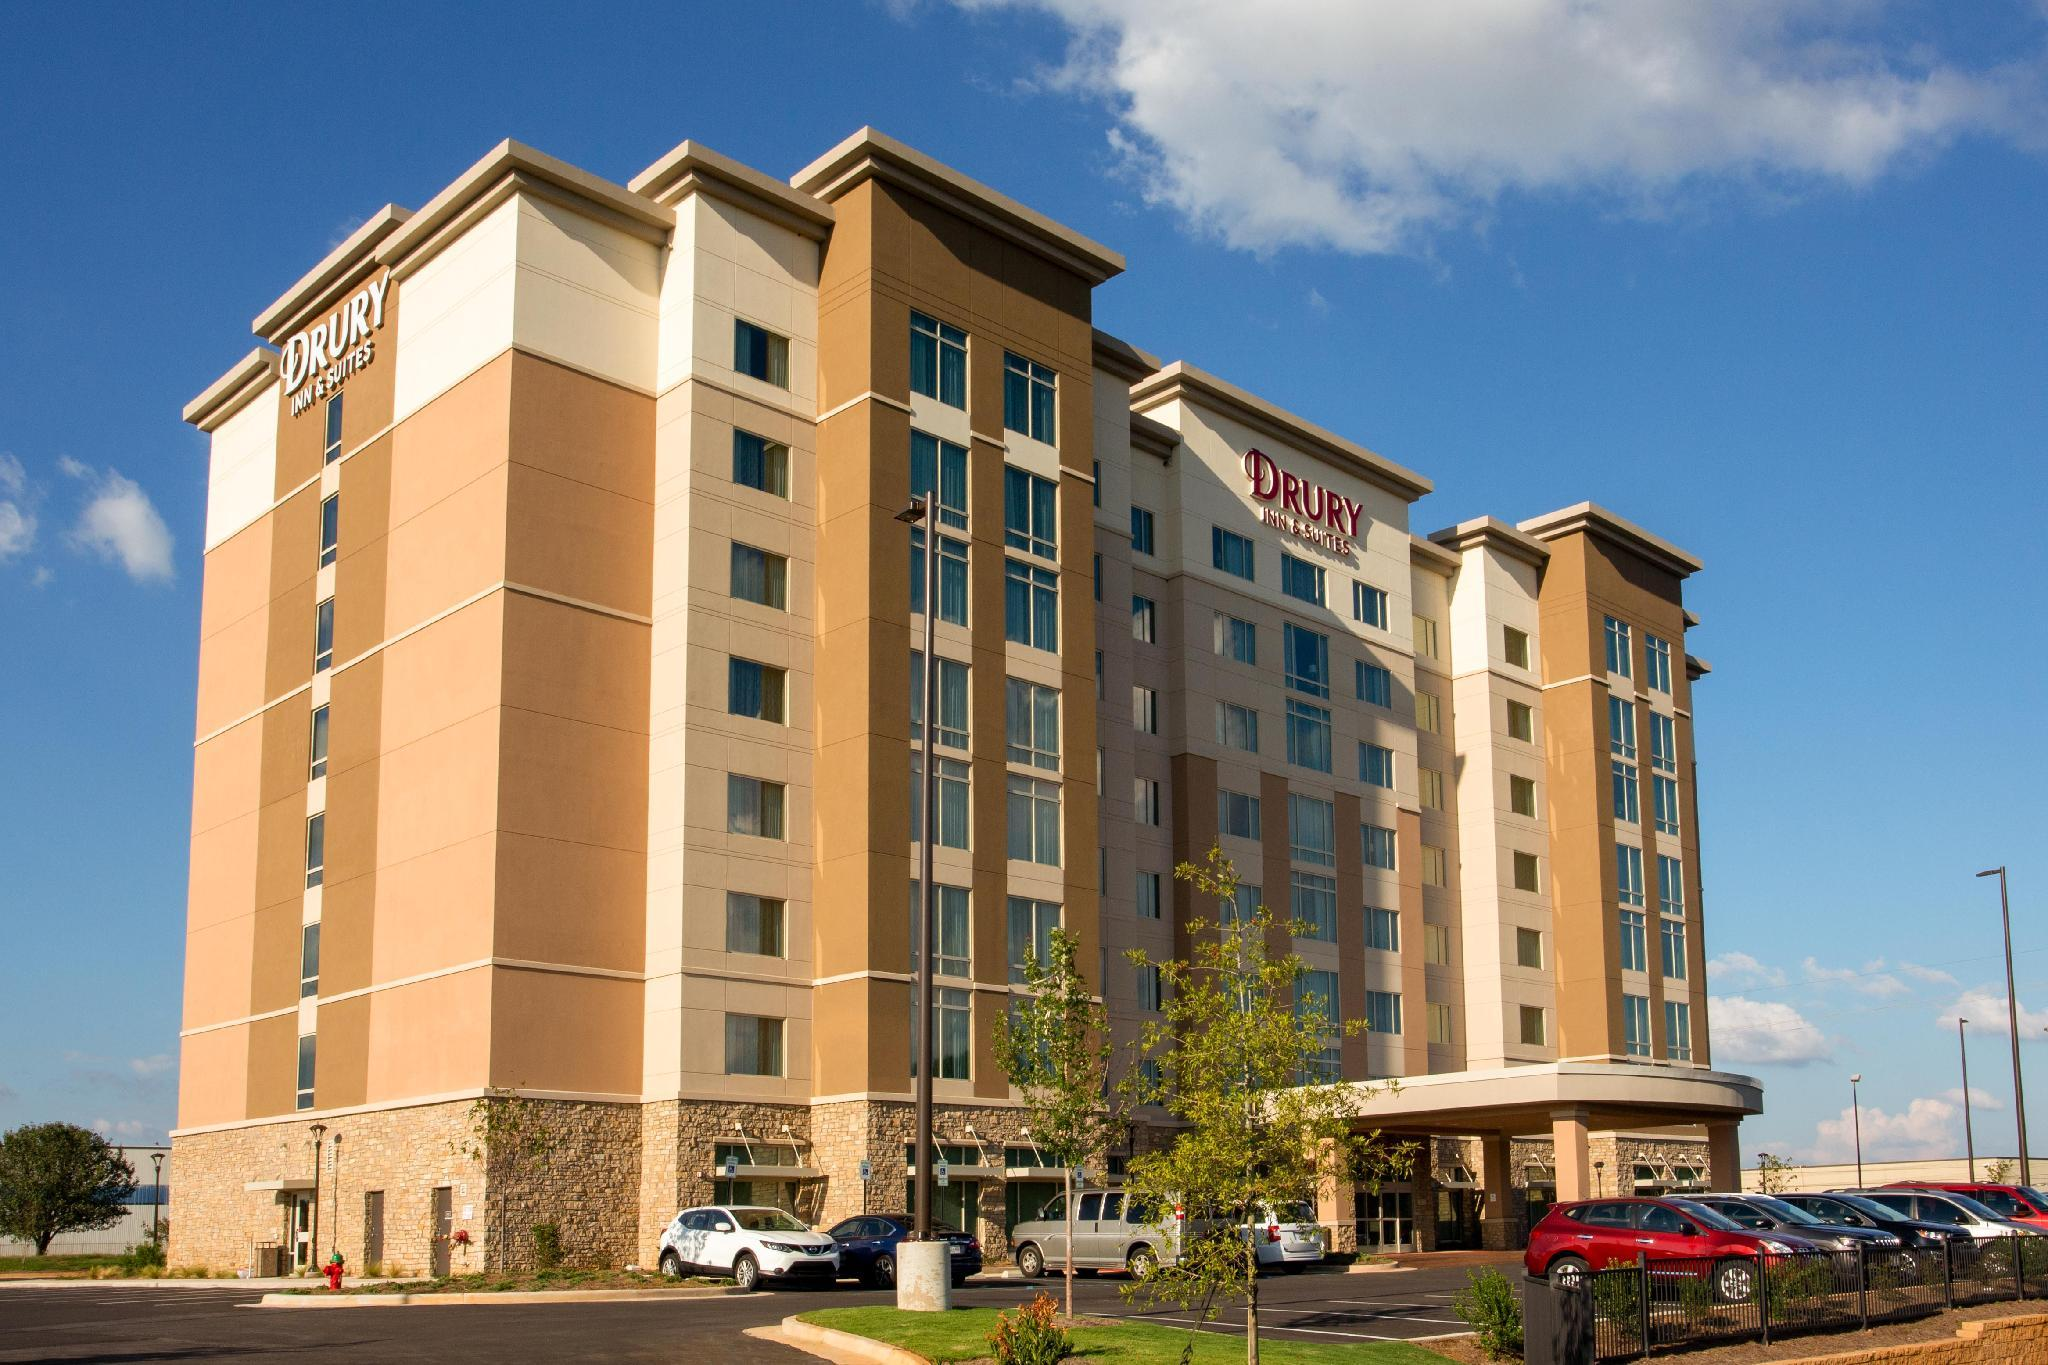 Drury Inn And Suites Cleveland Beachwood